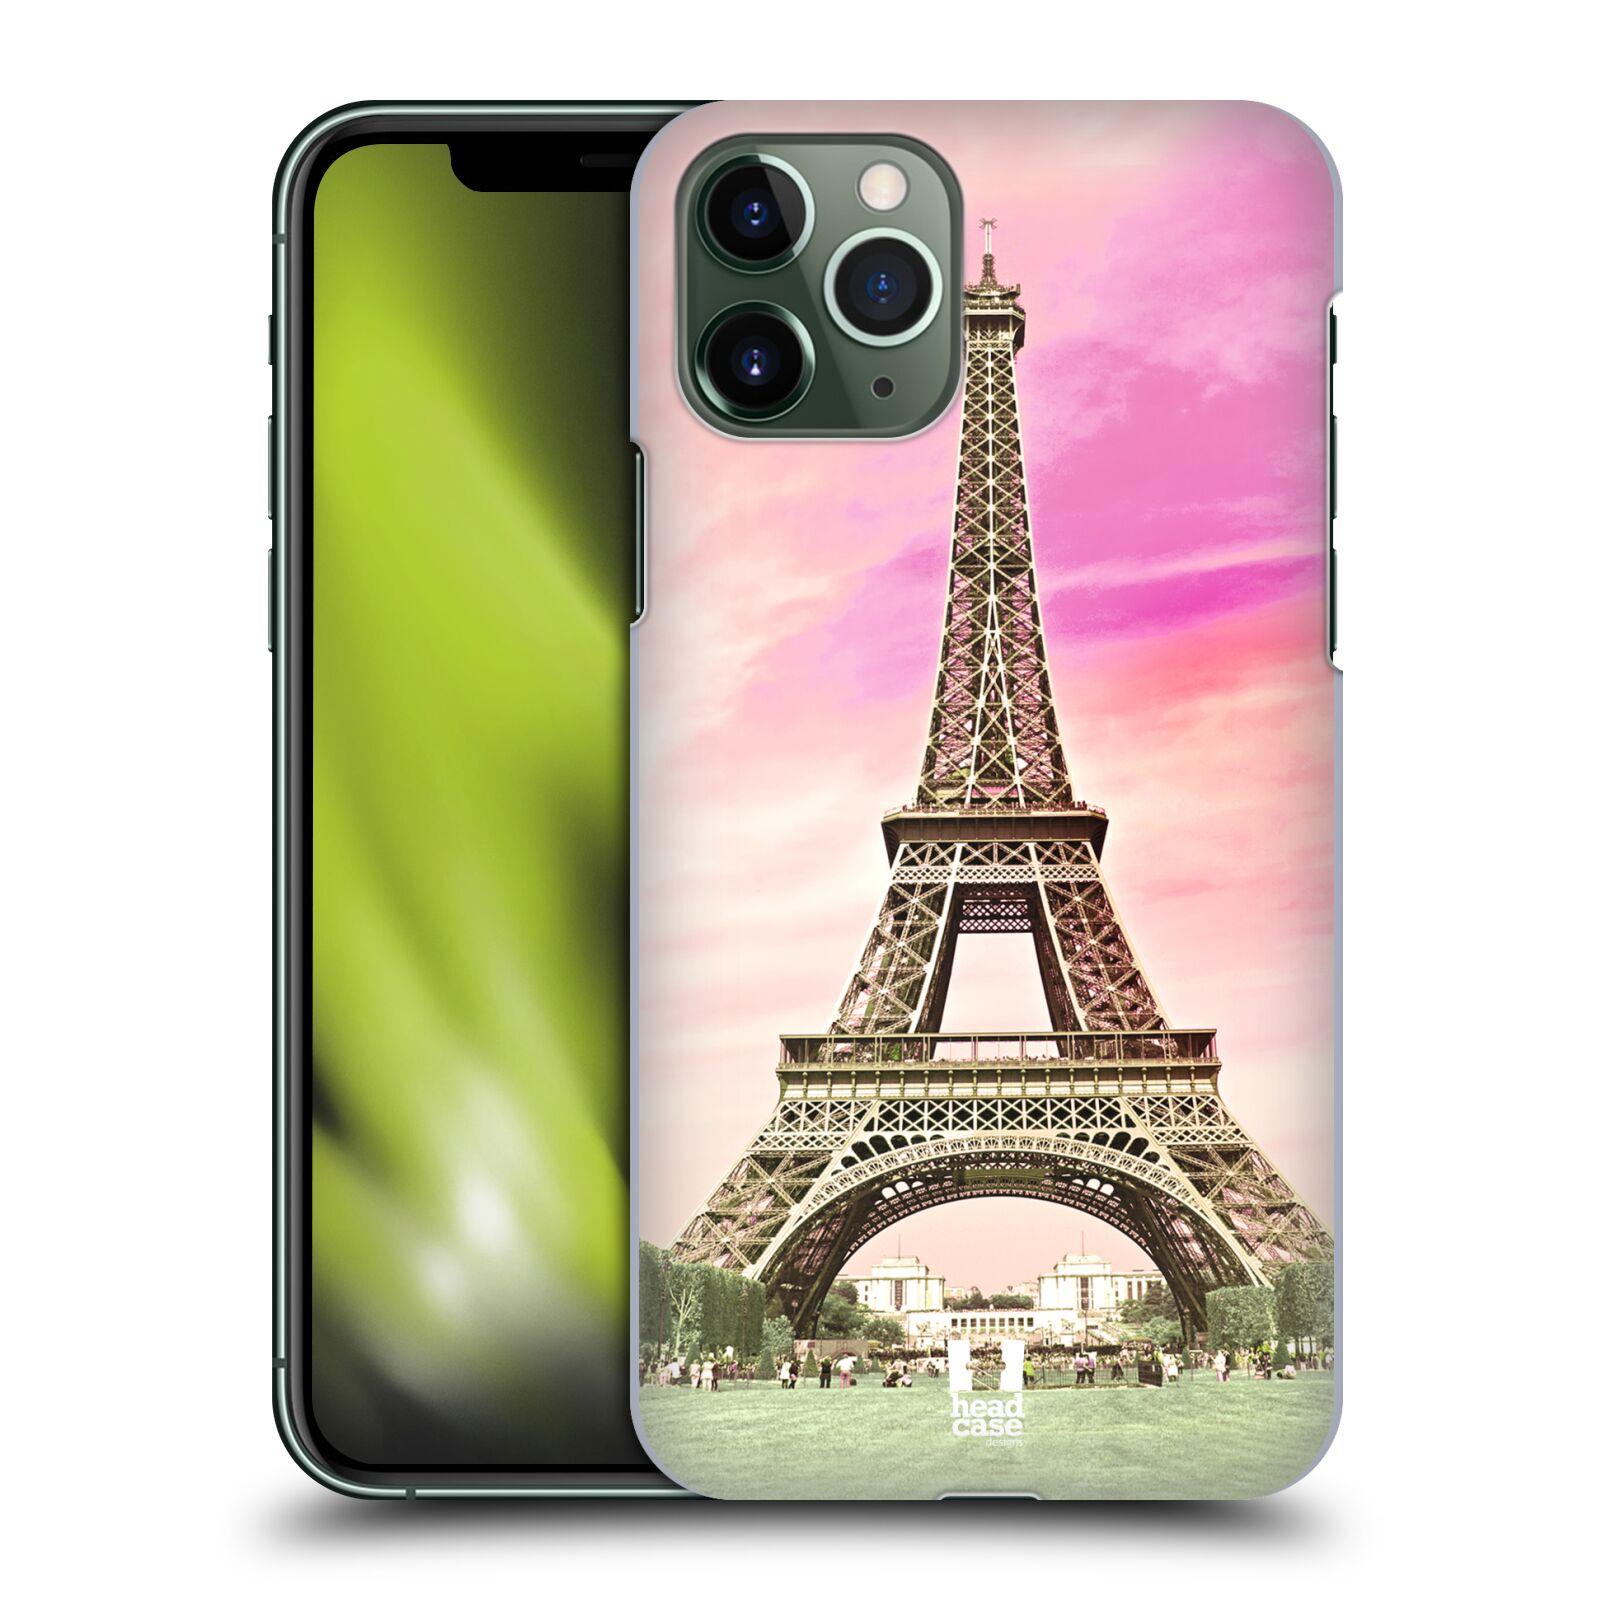 iphone 6s gumovy kryt , Plastové pouzdro na mobil Apple iPhone 11 Pro - Head Case - RŮŽOVÁ AIFELOVKA